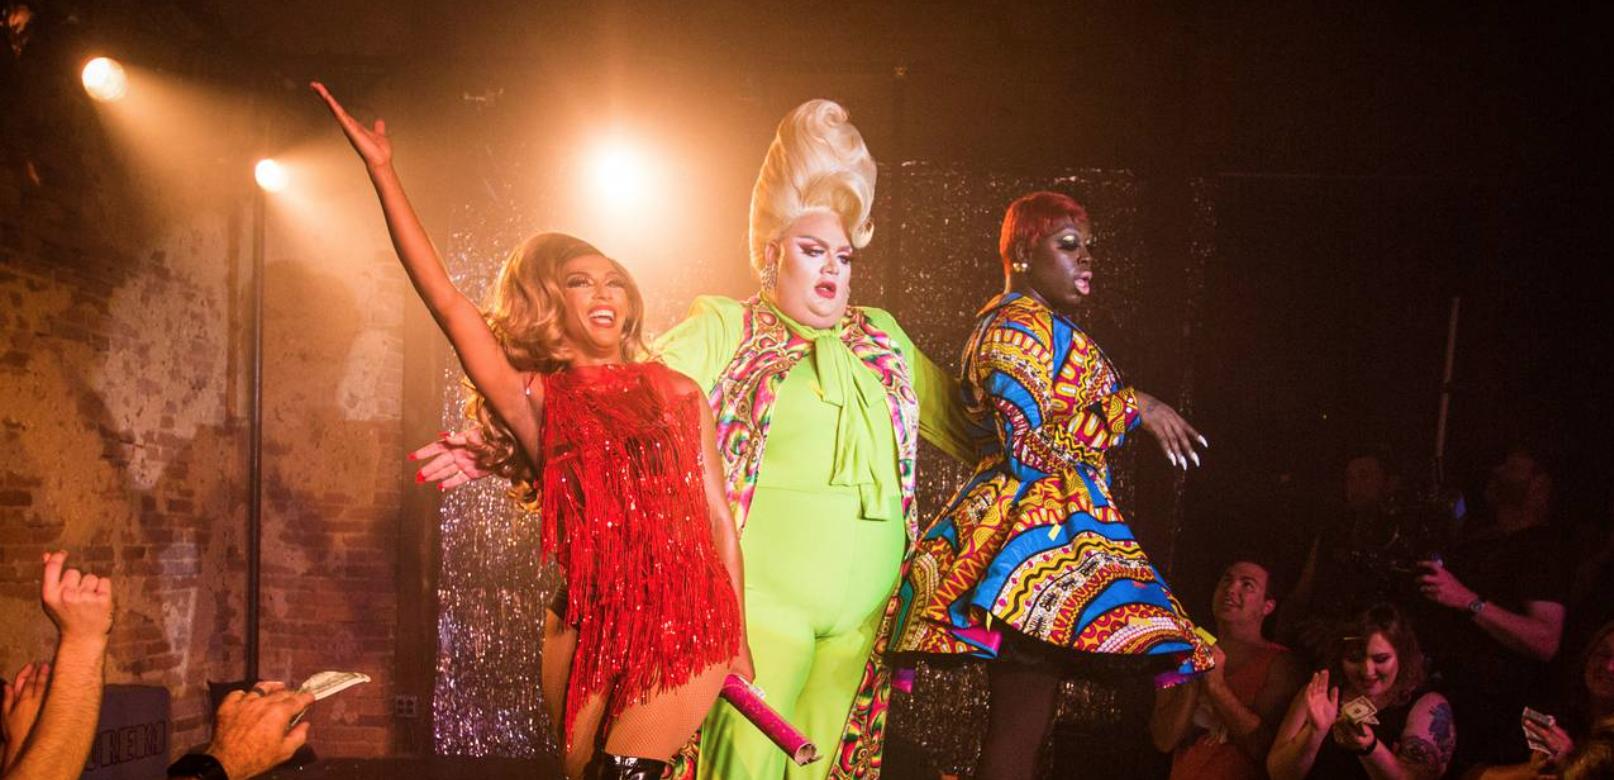 Screenshot of the drag queen trio